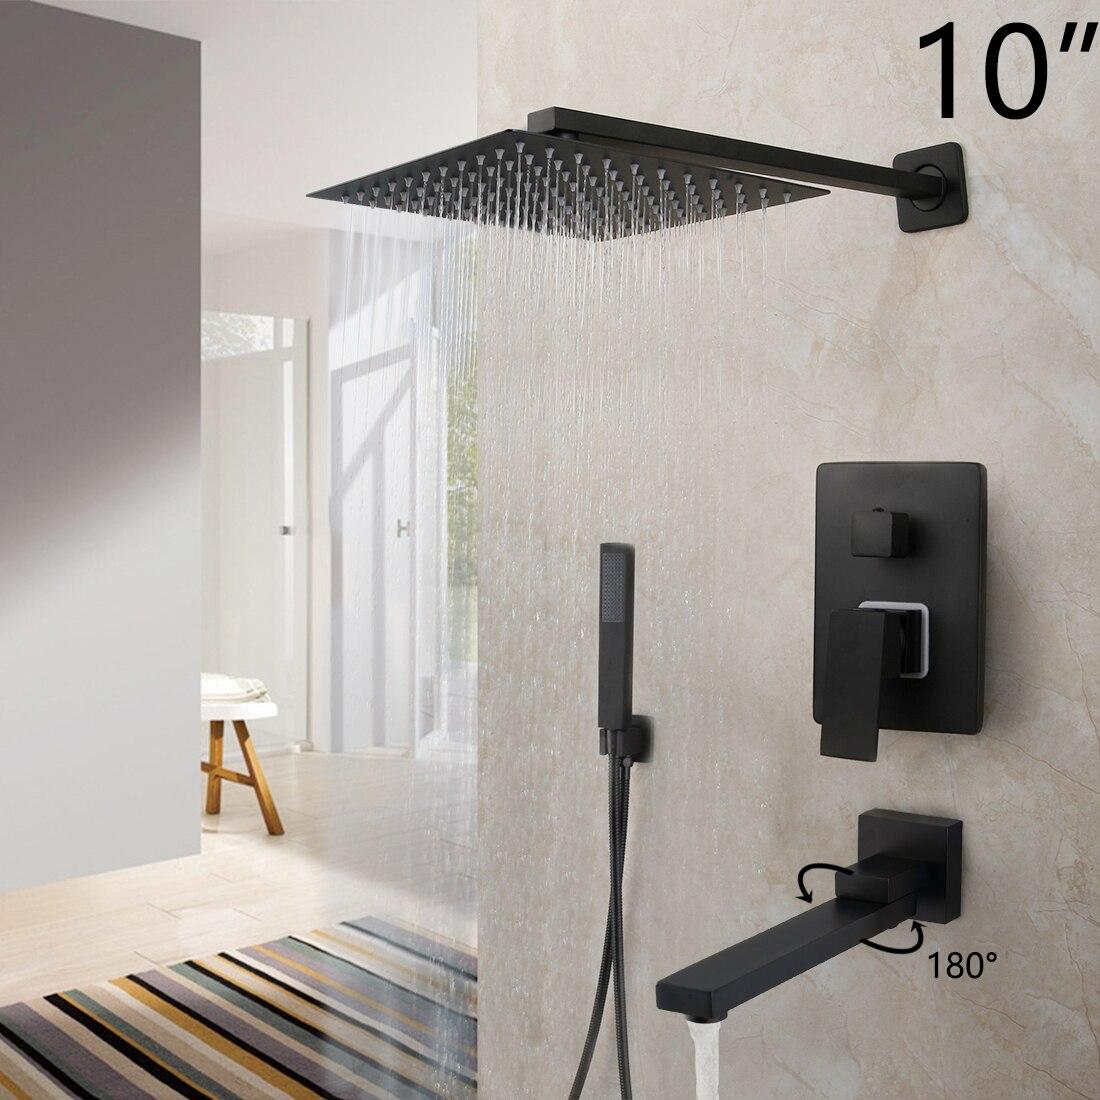 10 Inch Shower W2